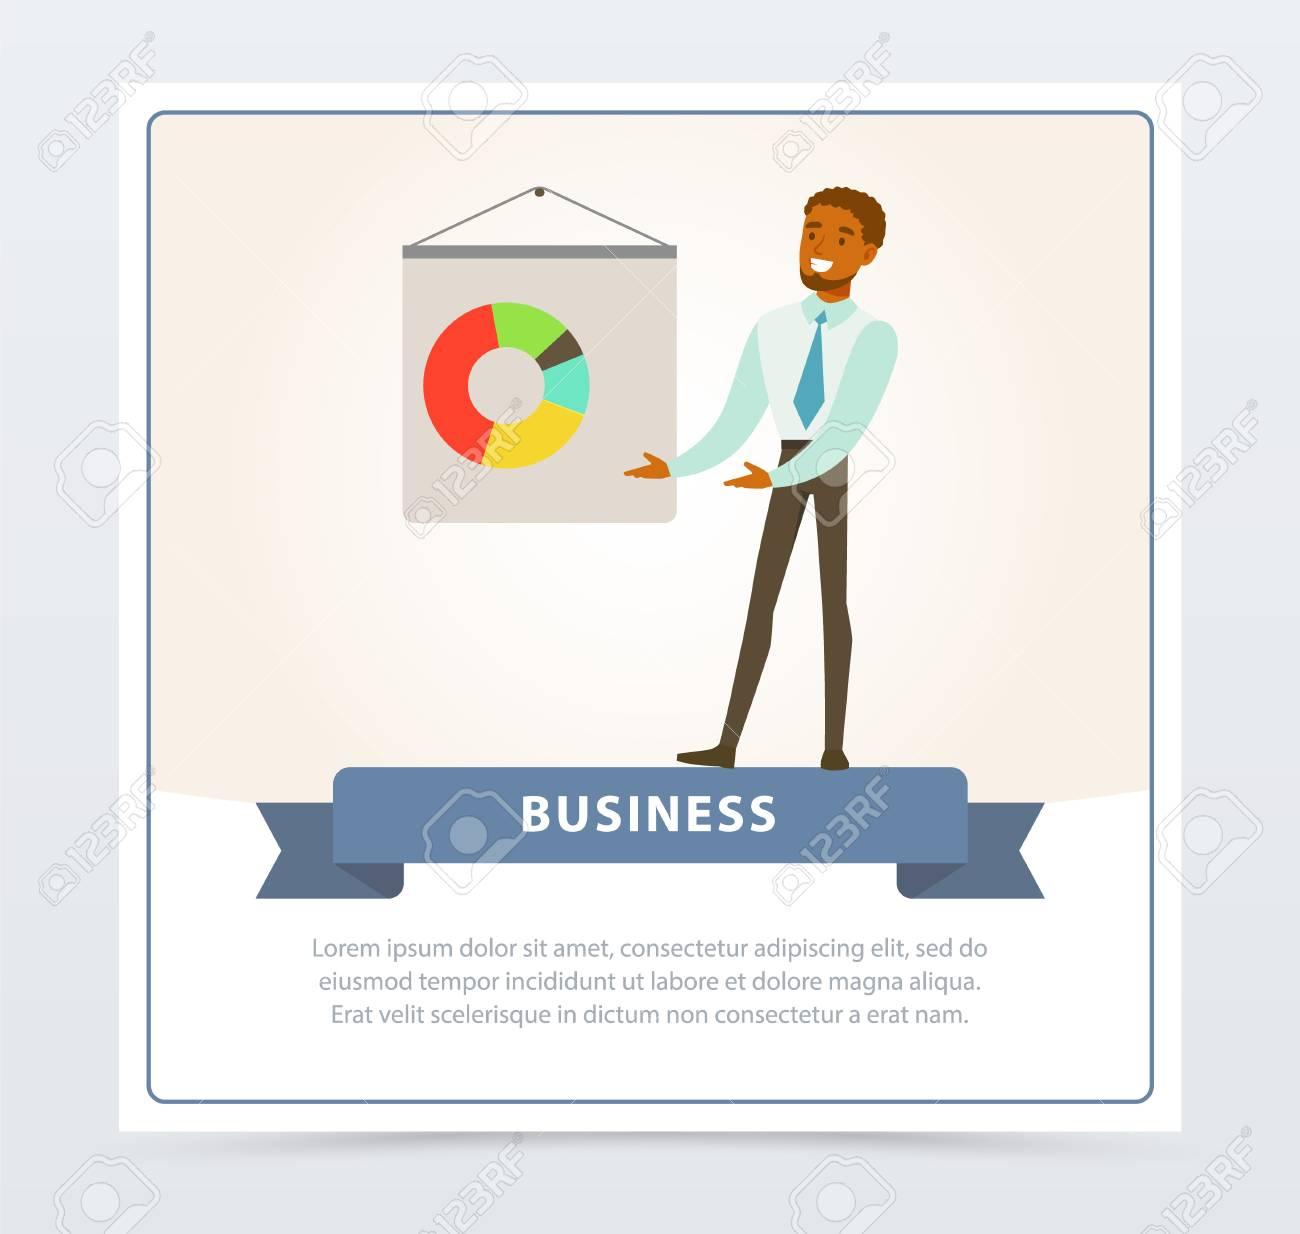 Businessman making presentation and explaining chart on a whiteboard,